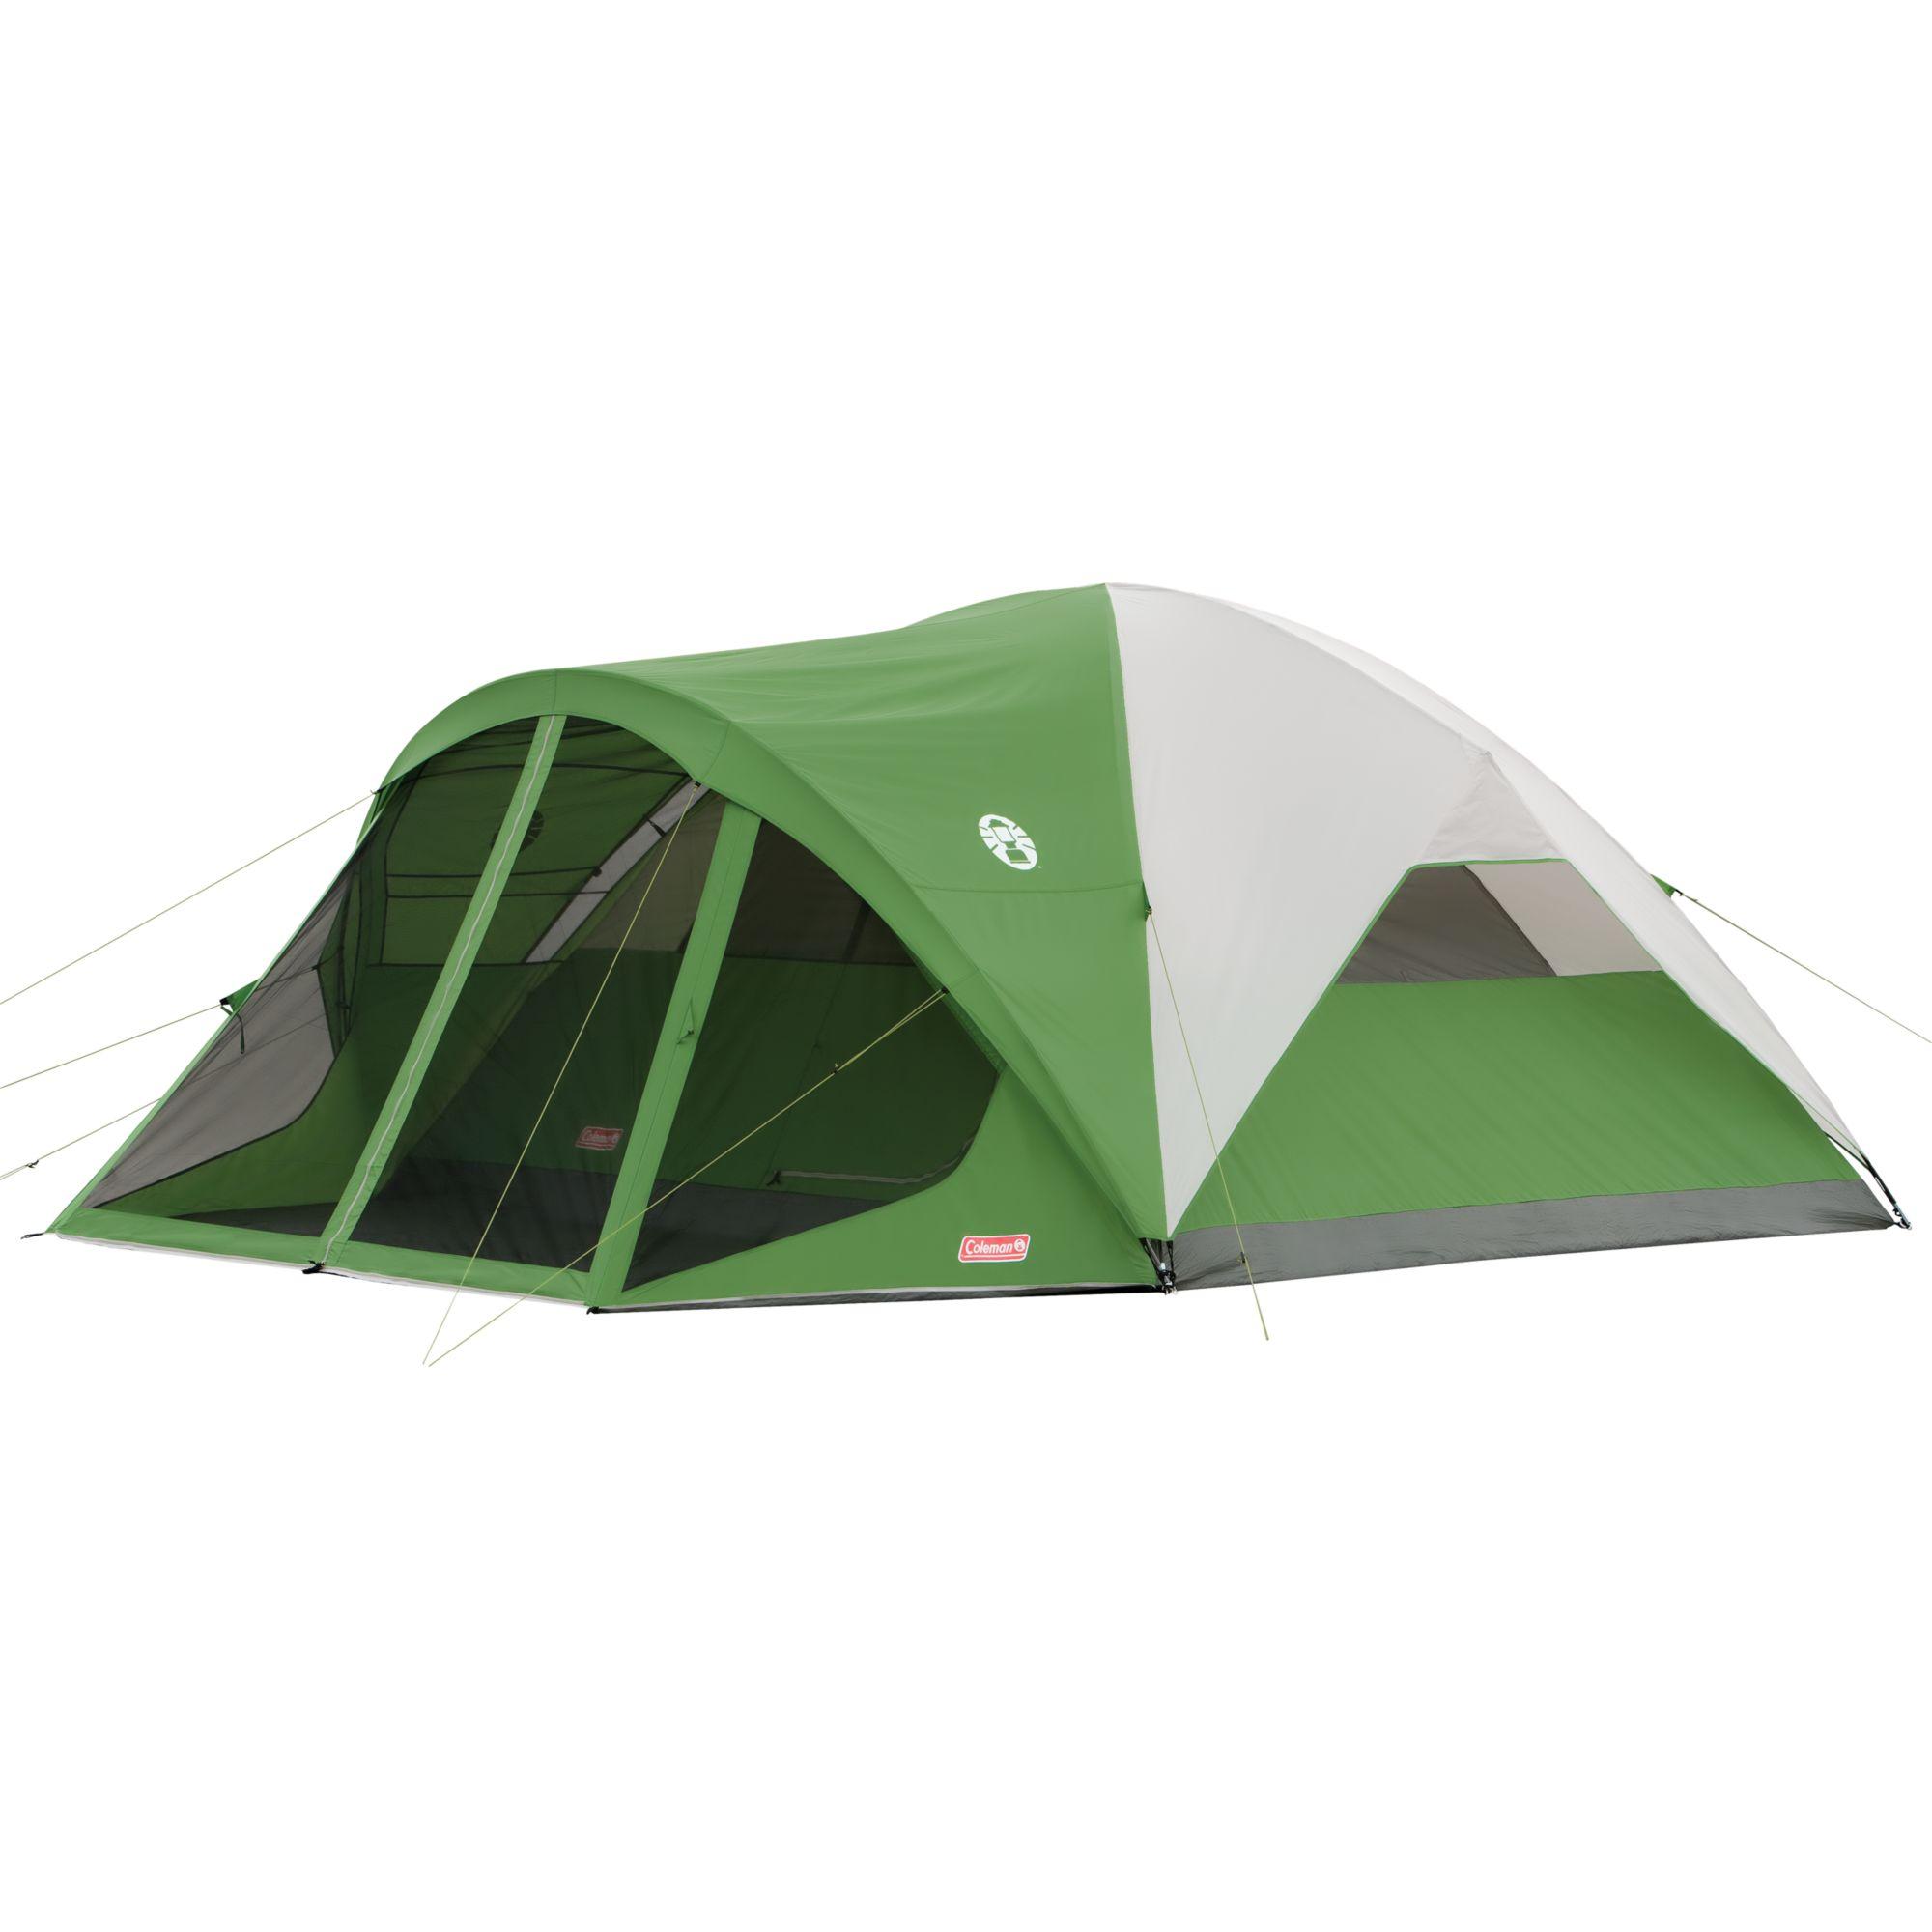 Coleman Evanston Screened Tent  sc 1 st  Outdoor Intensity & 10 Best Family Camping Tents of 2017 | Outdoor Intensity